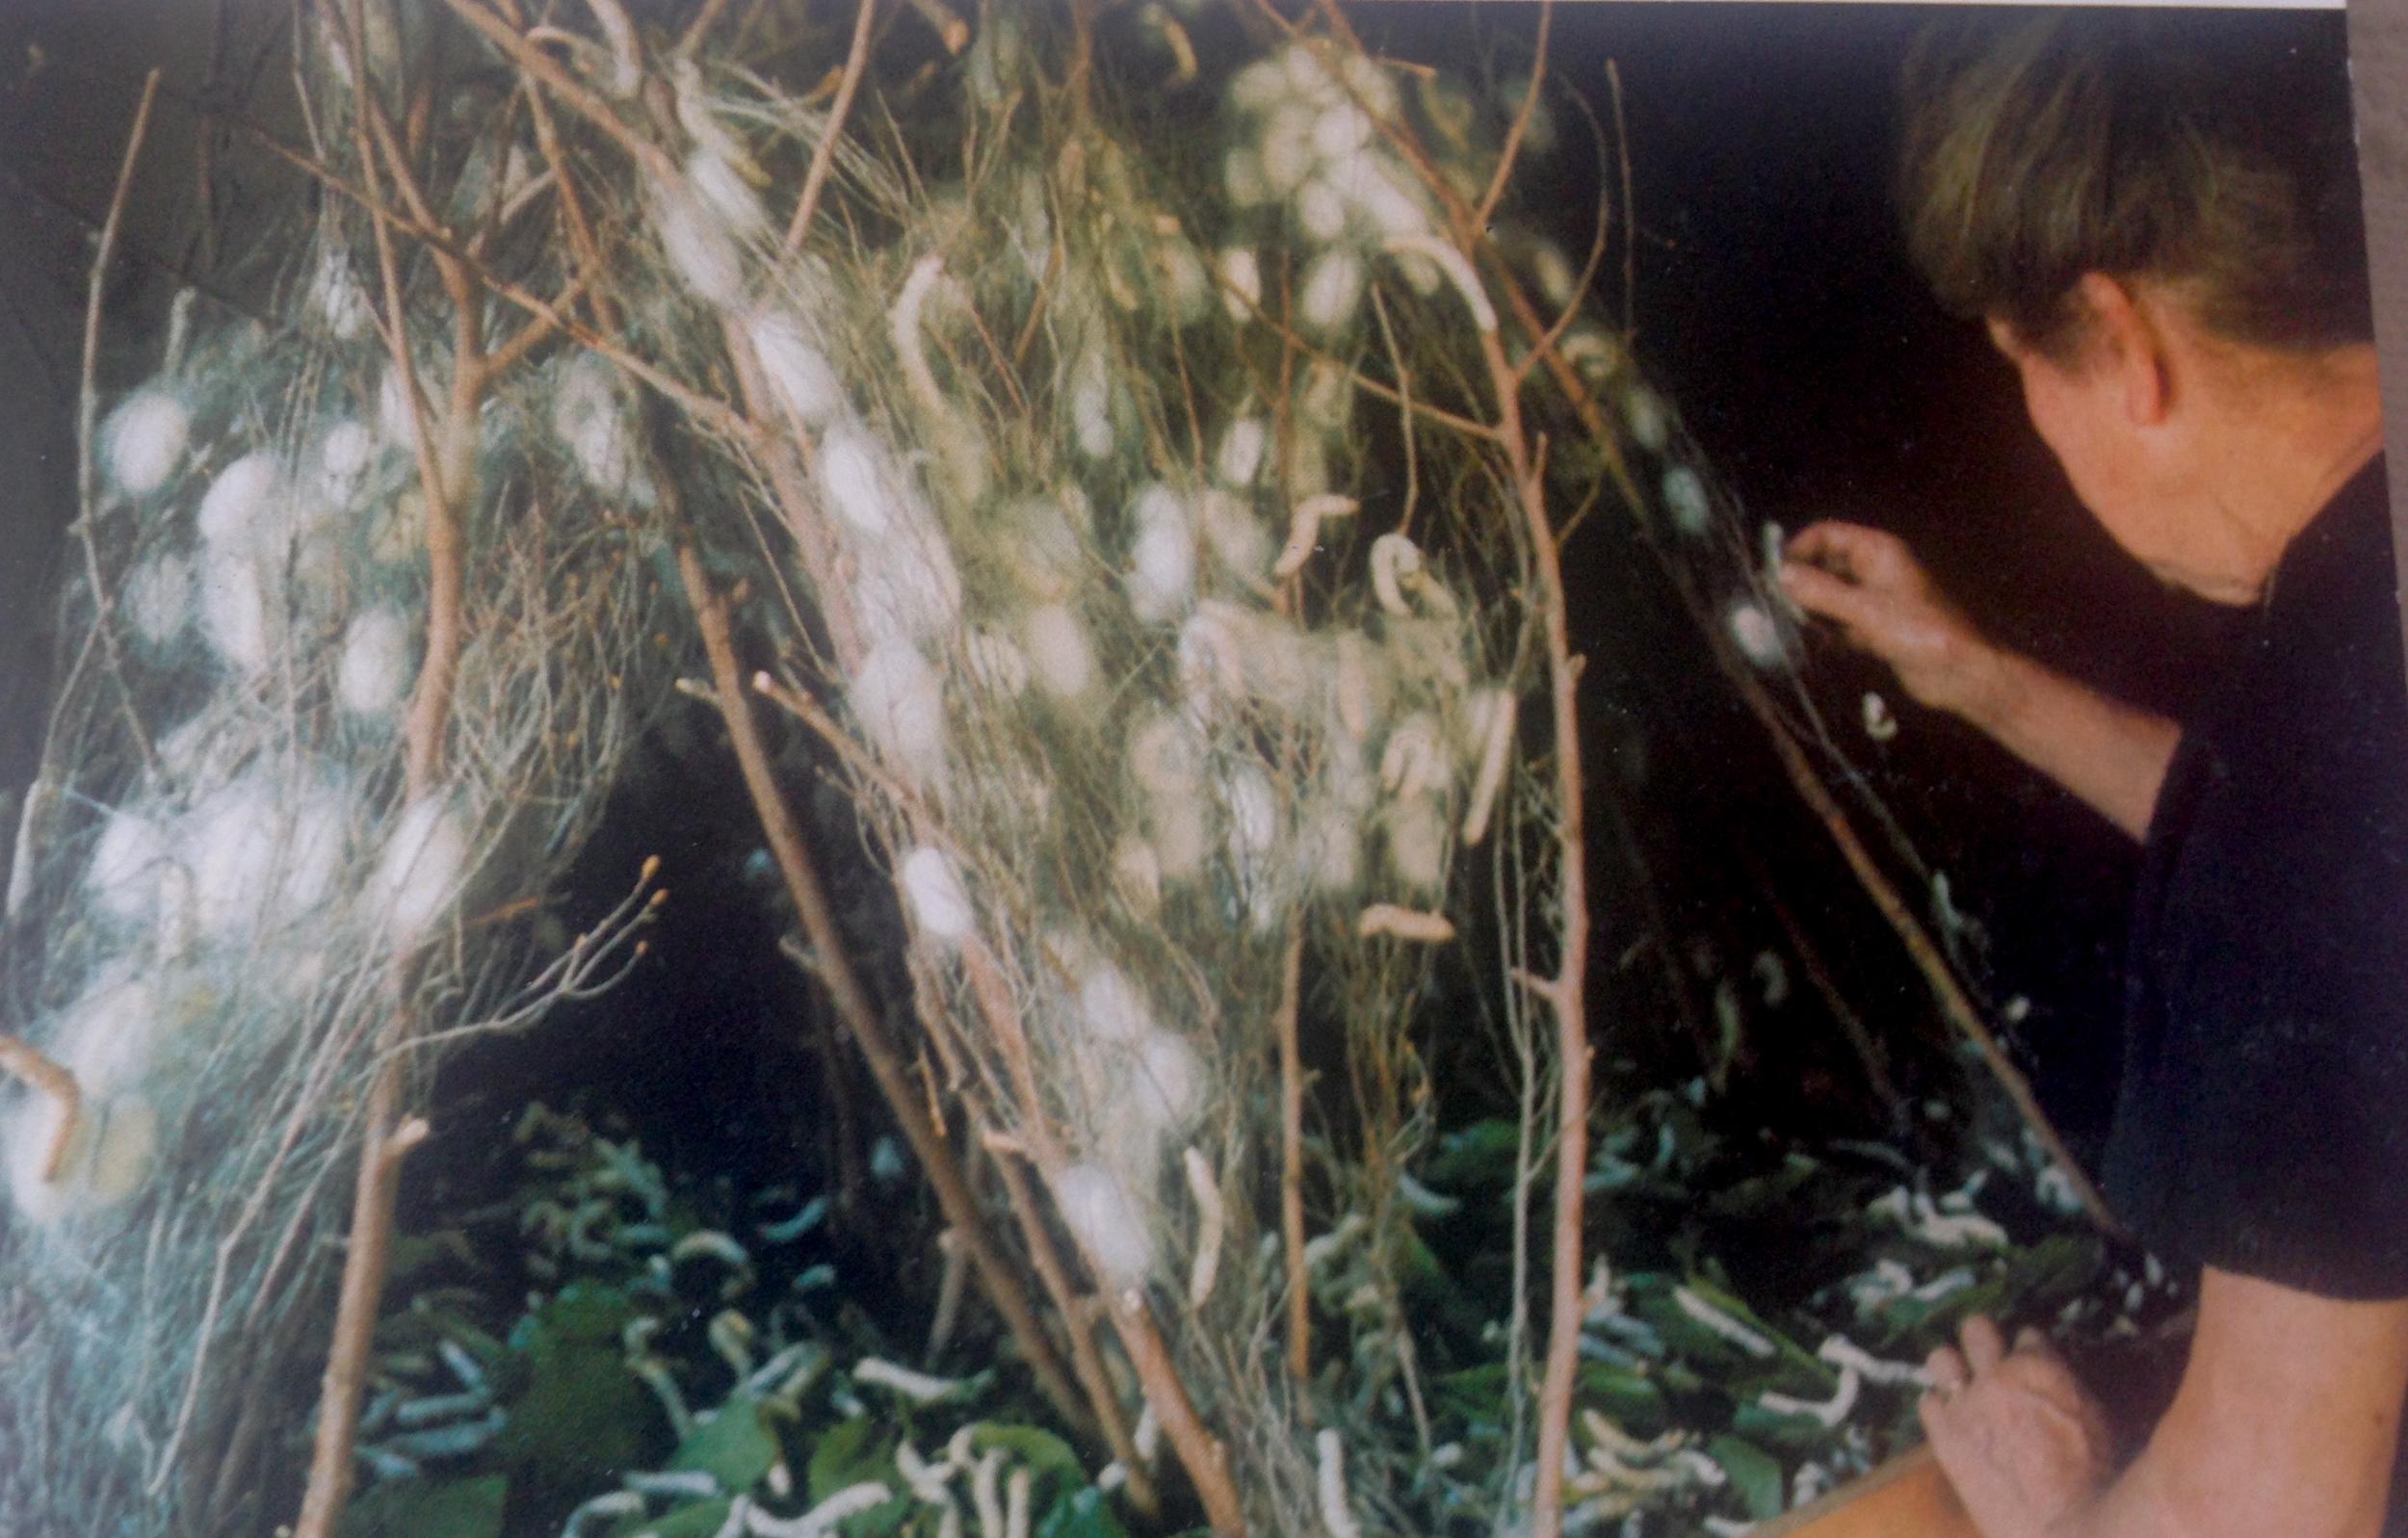 Dans la magnanerie ~ when the caterpillars climb the heather. Note the caterpillars feeding on mulberry leaves beneath. Photo from the book by Bernard Henry,  Des Métiers et des Hommes à la Lisière des Bois